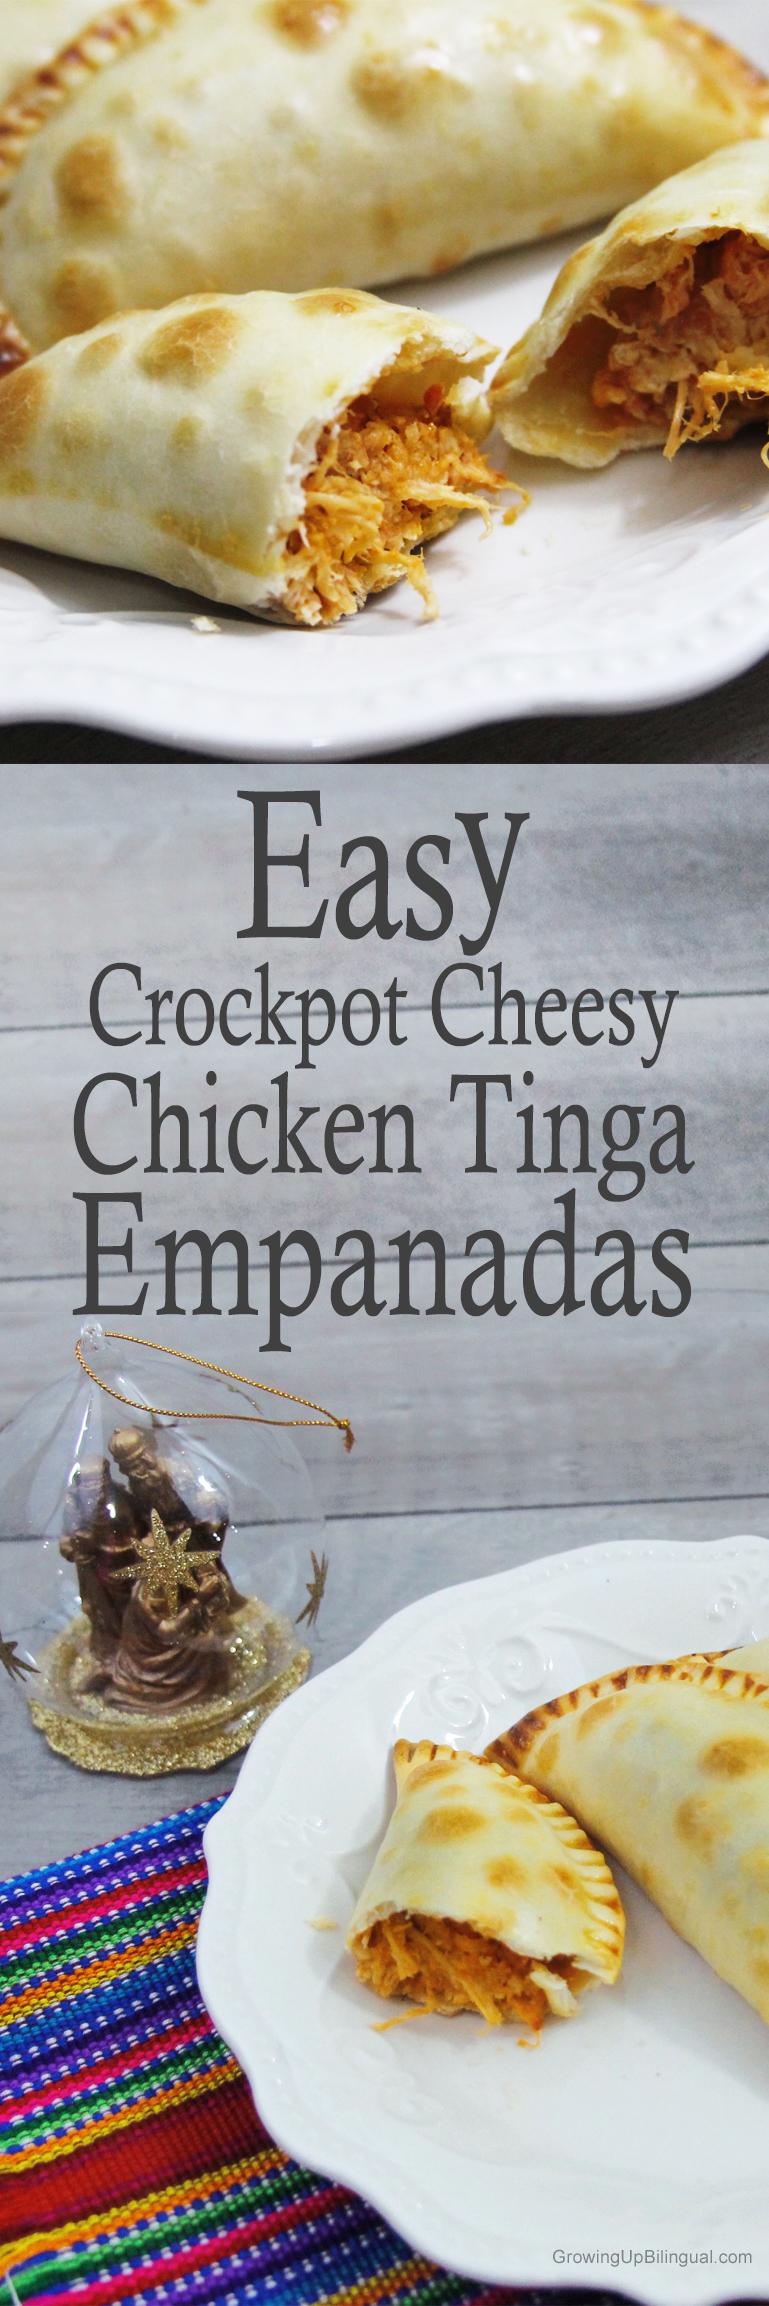 empanadas pinterest